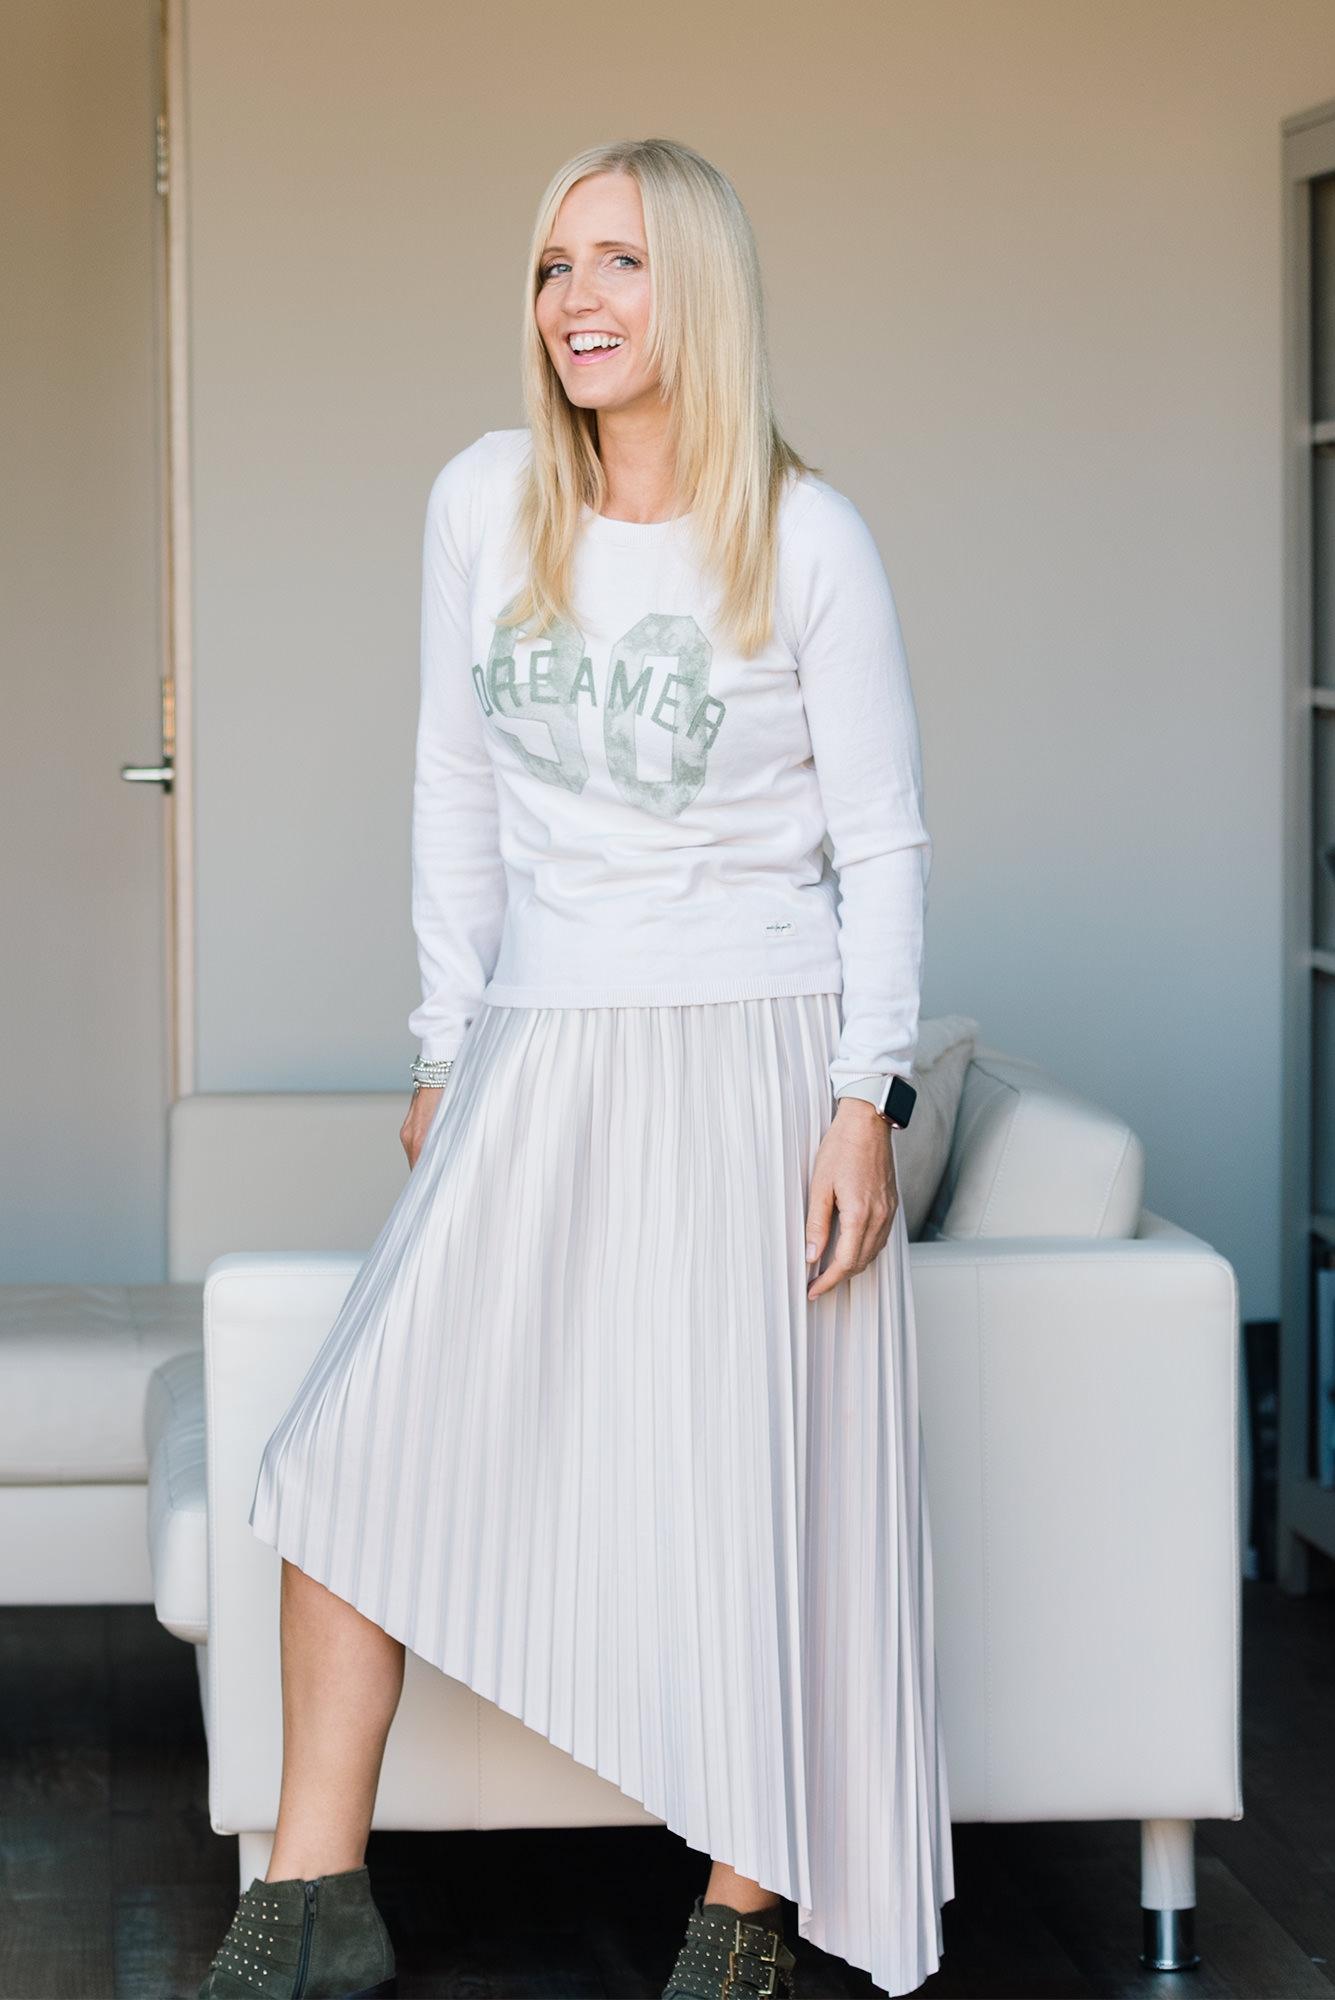 fashion-blogger-wearing-cream-pleated-skirt